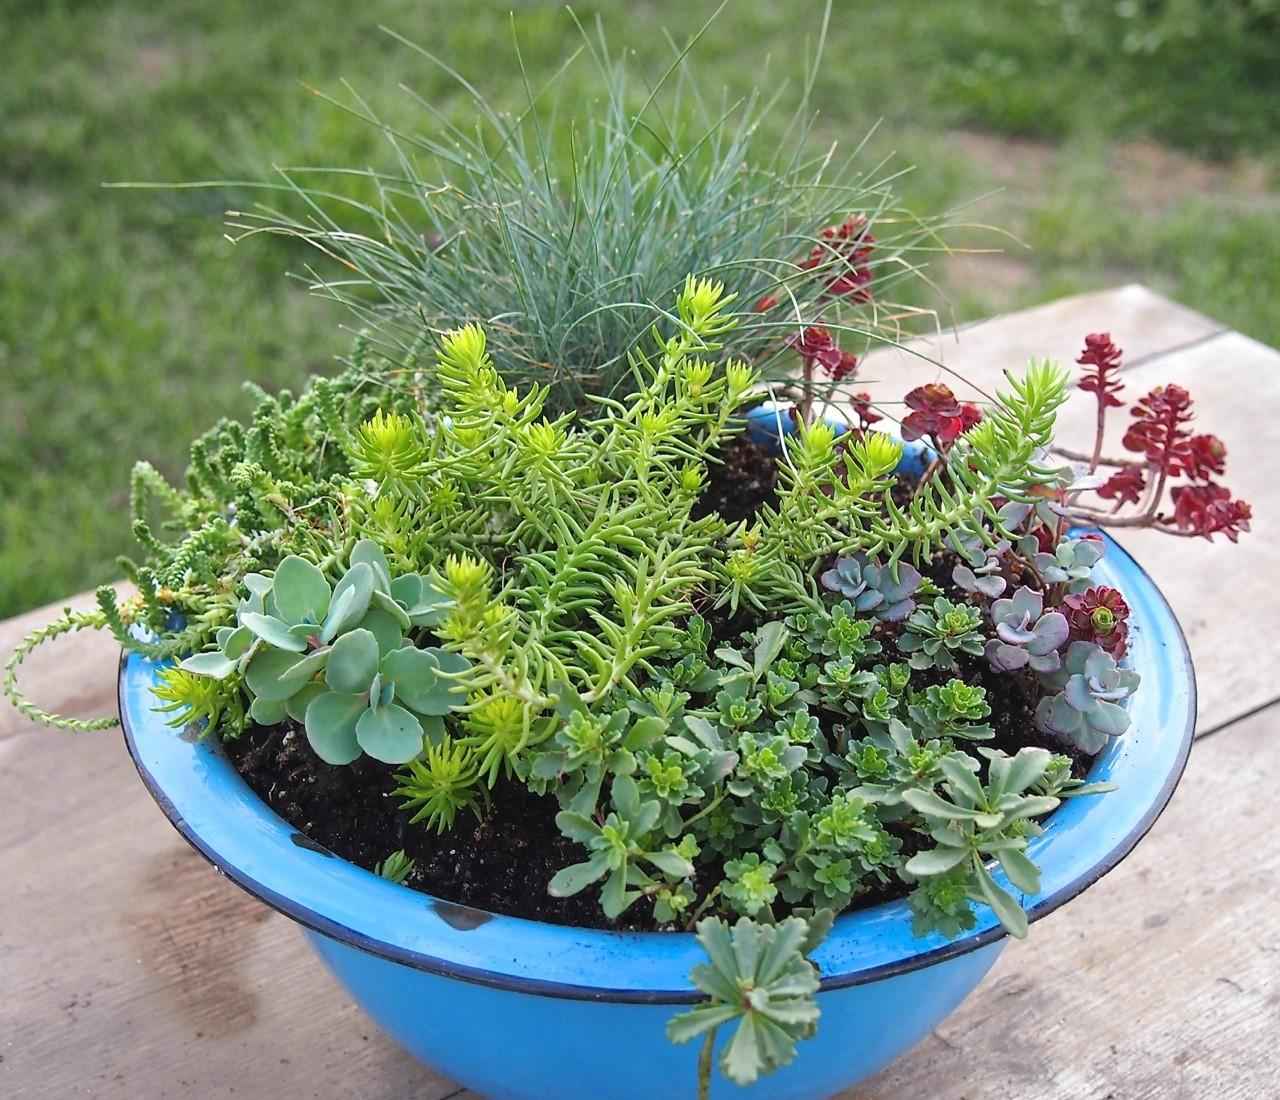 Giardini piante grasse per esterno yk35 regardsdefemmes - Piante invernali da giardino ...